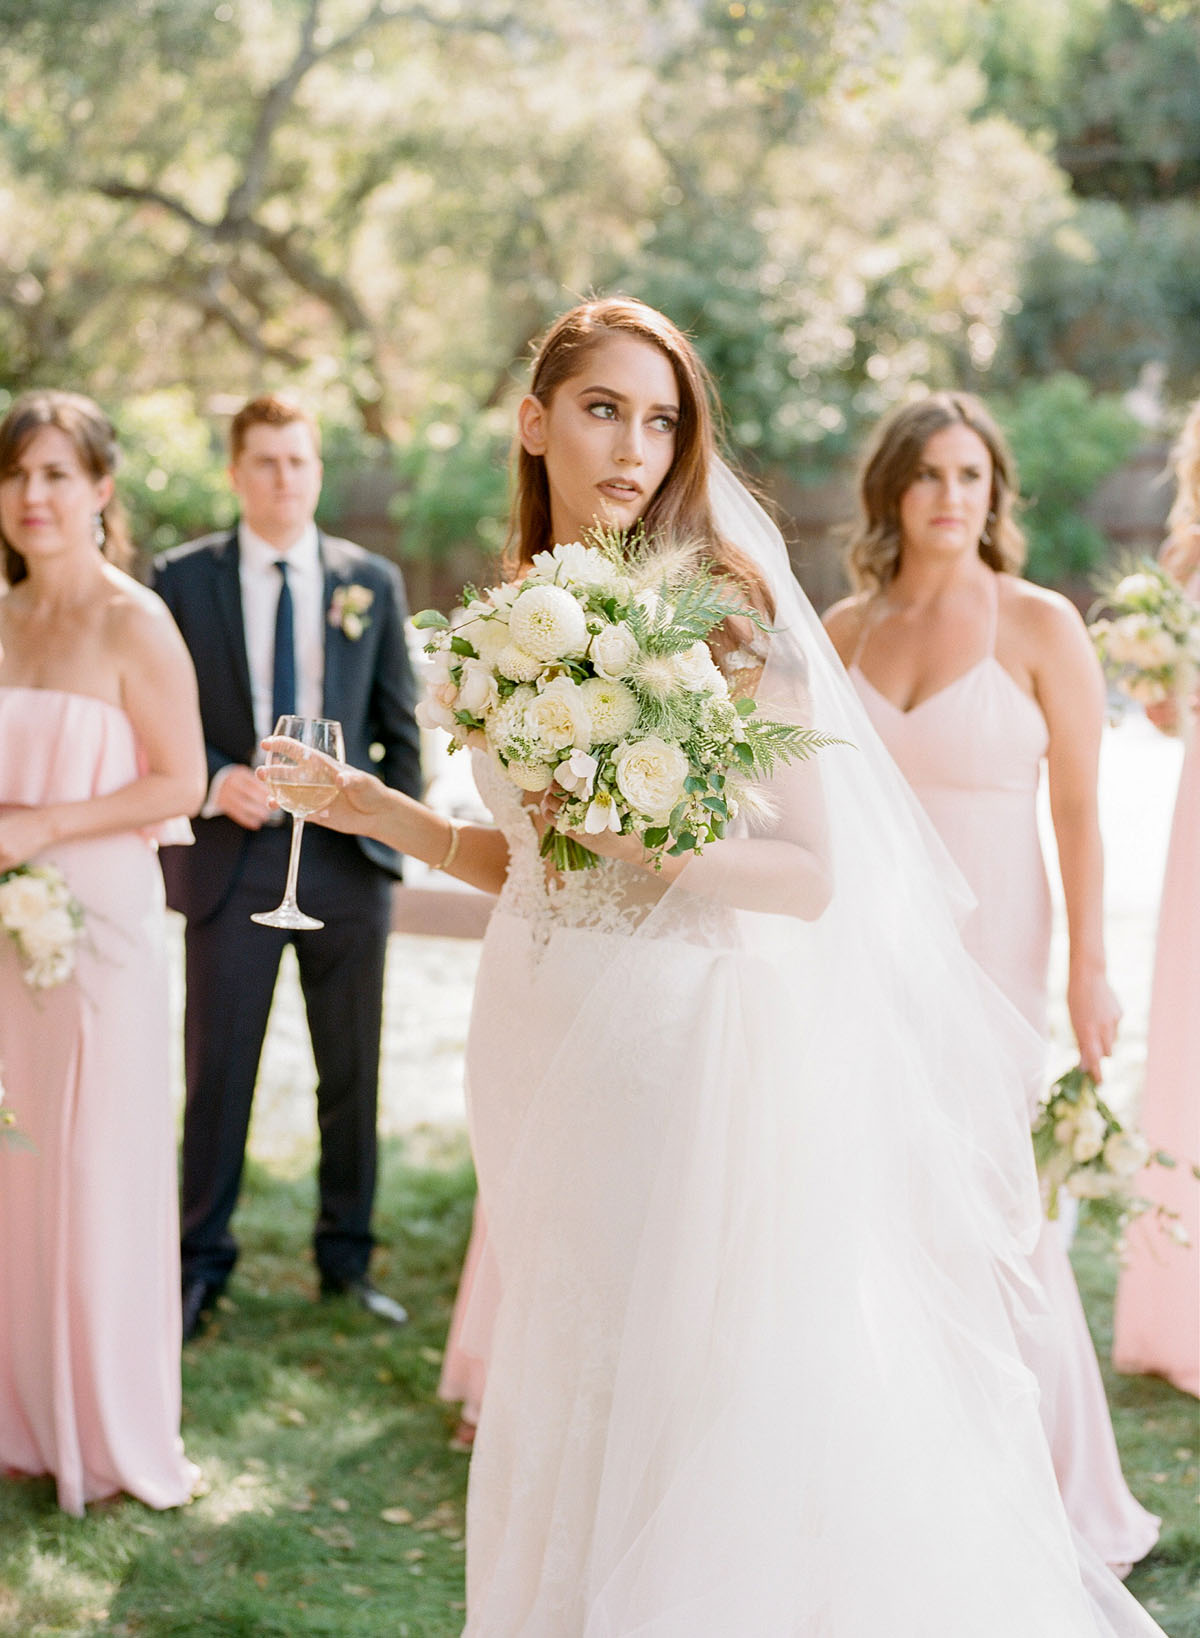 24-candid-wedding-christina-mcneill.jpg